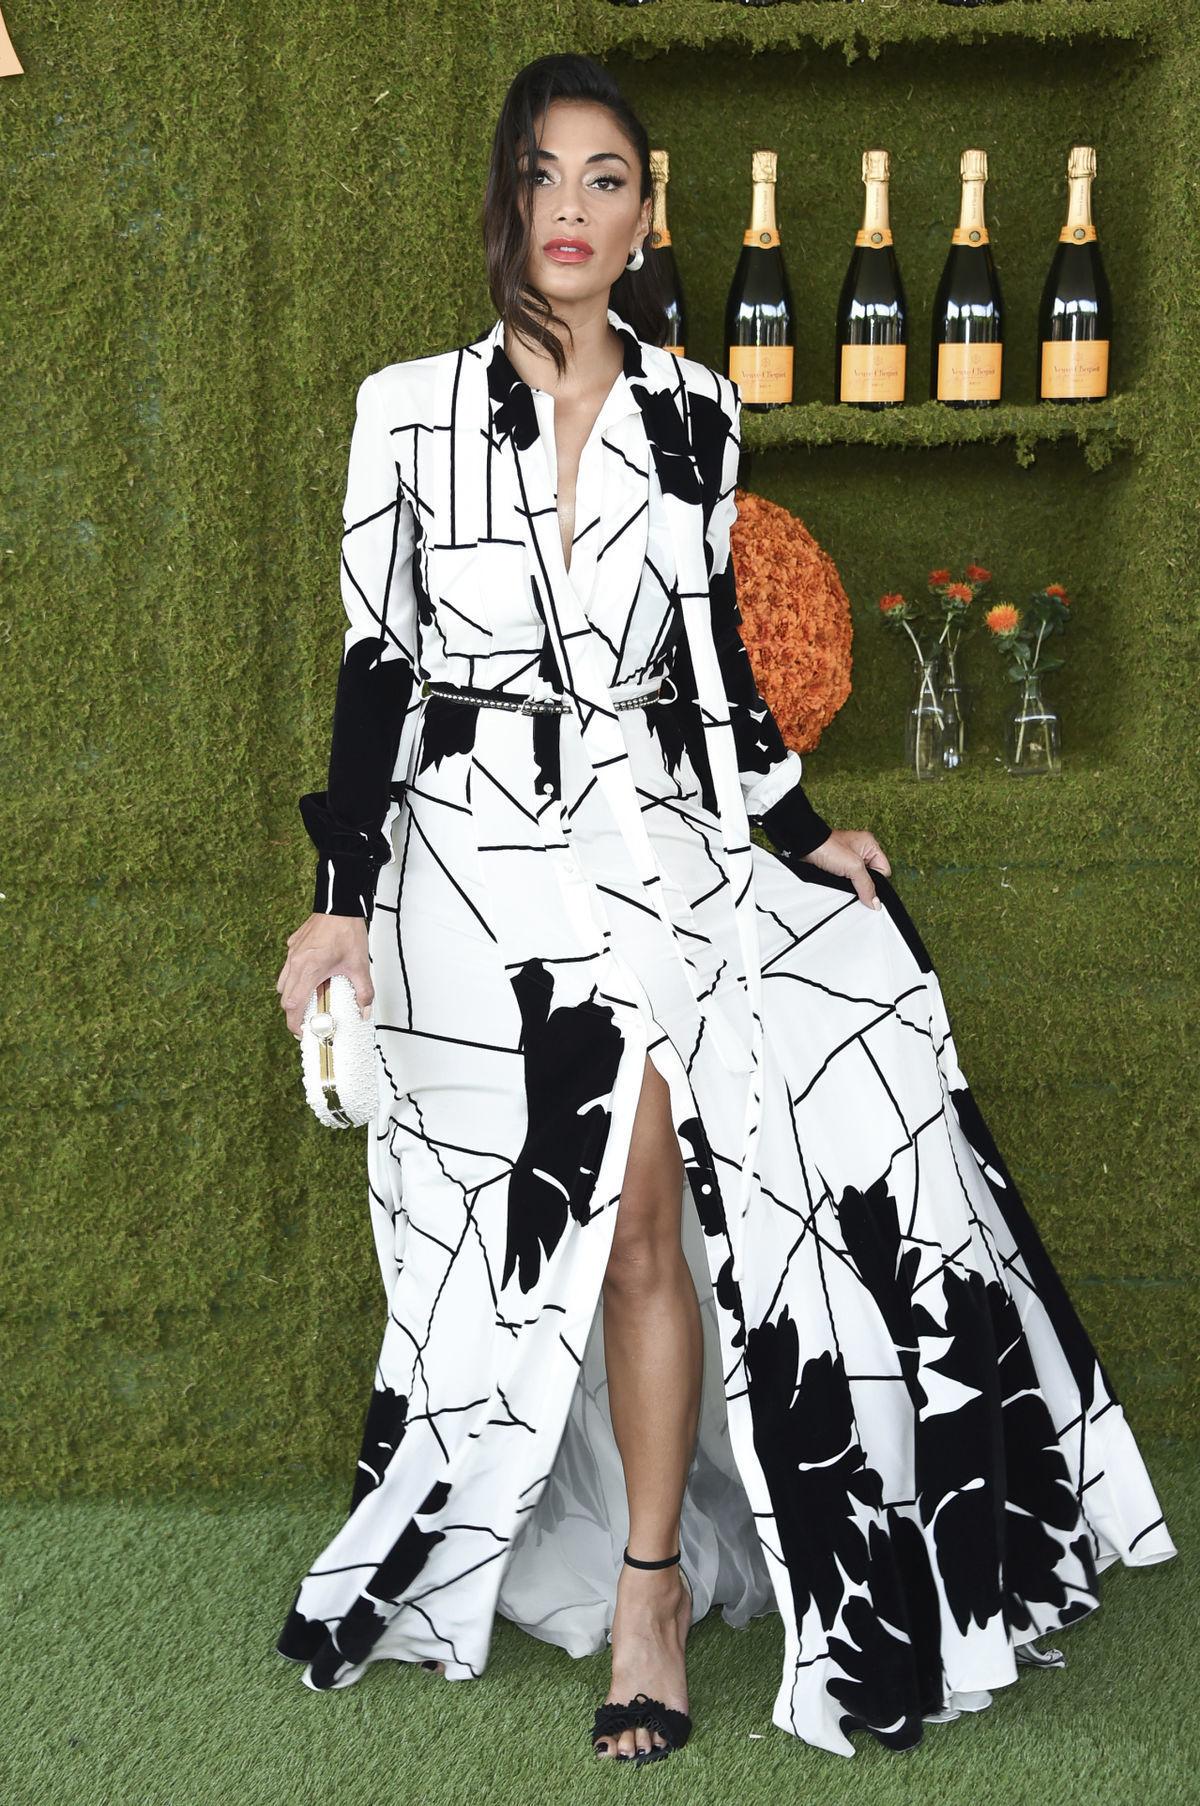 Speváčka a televízna porotkyňa Nicole Scherzinger.